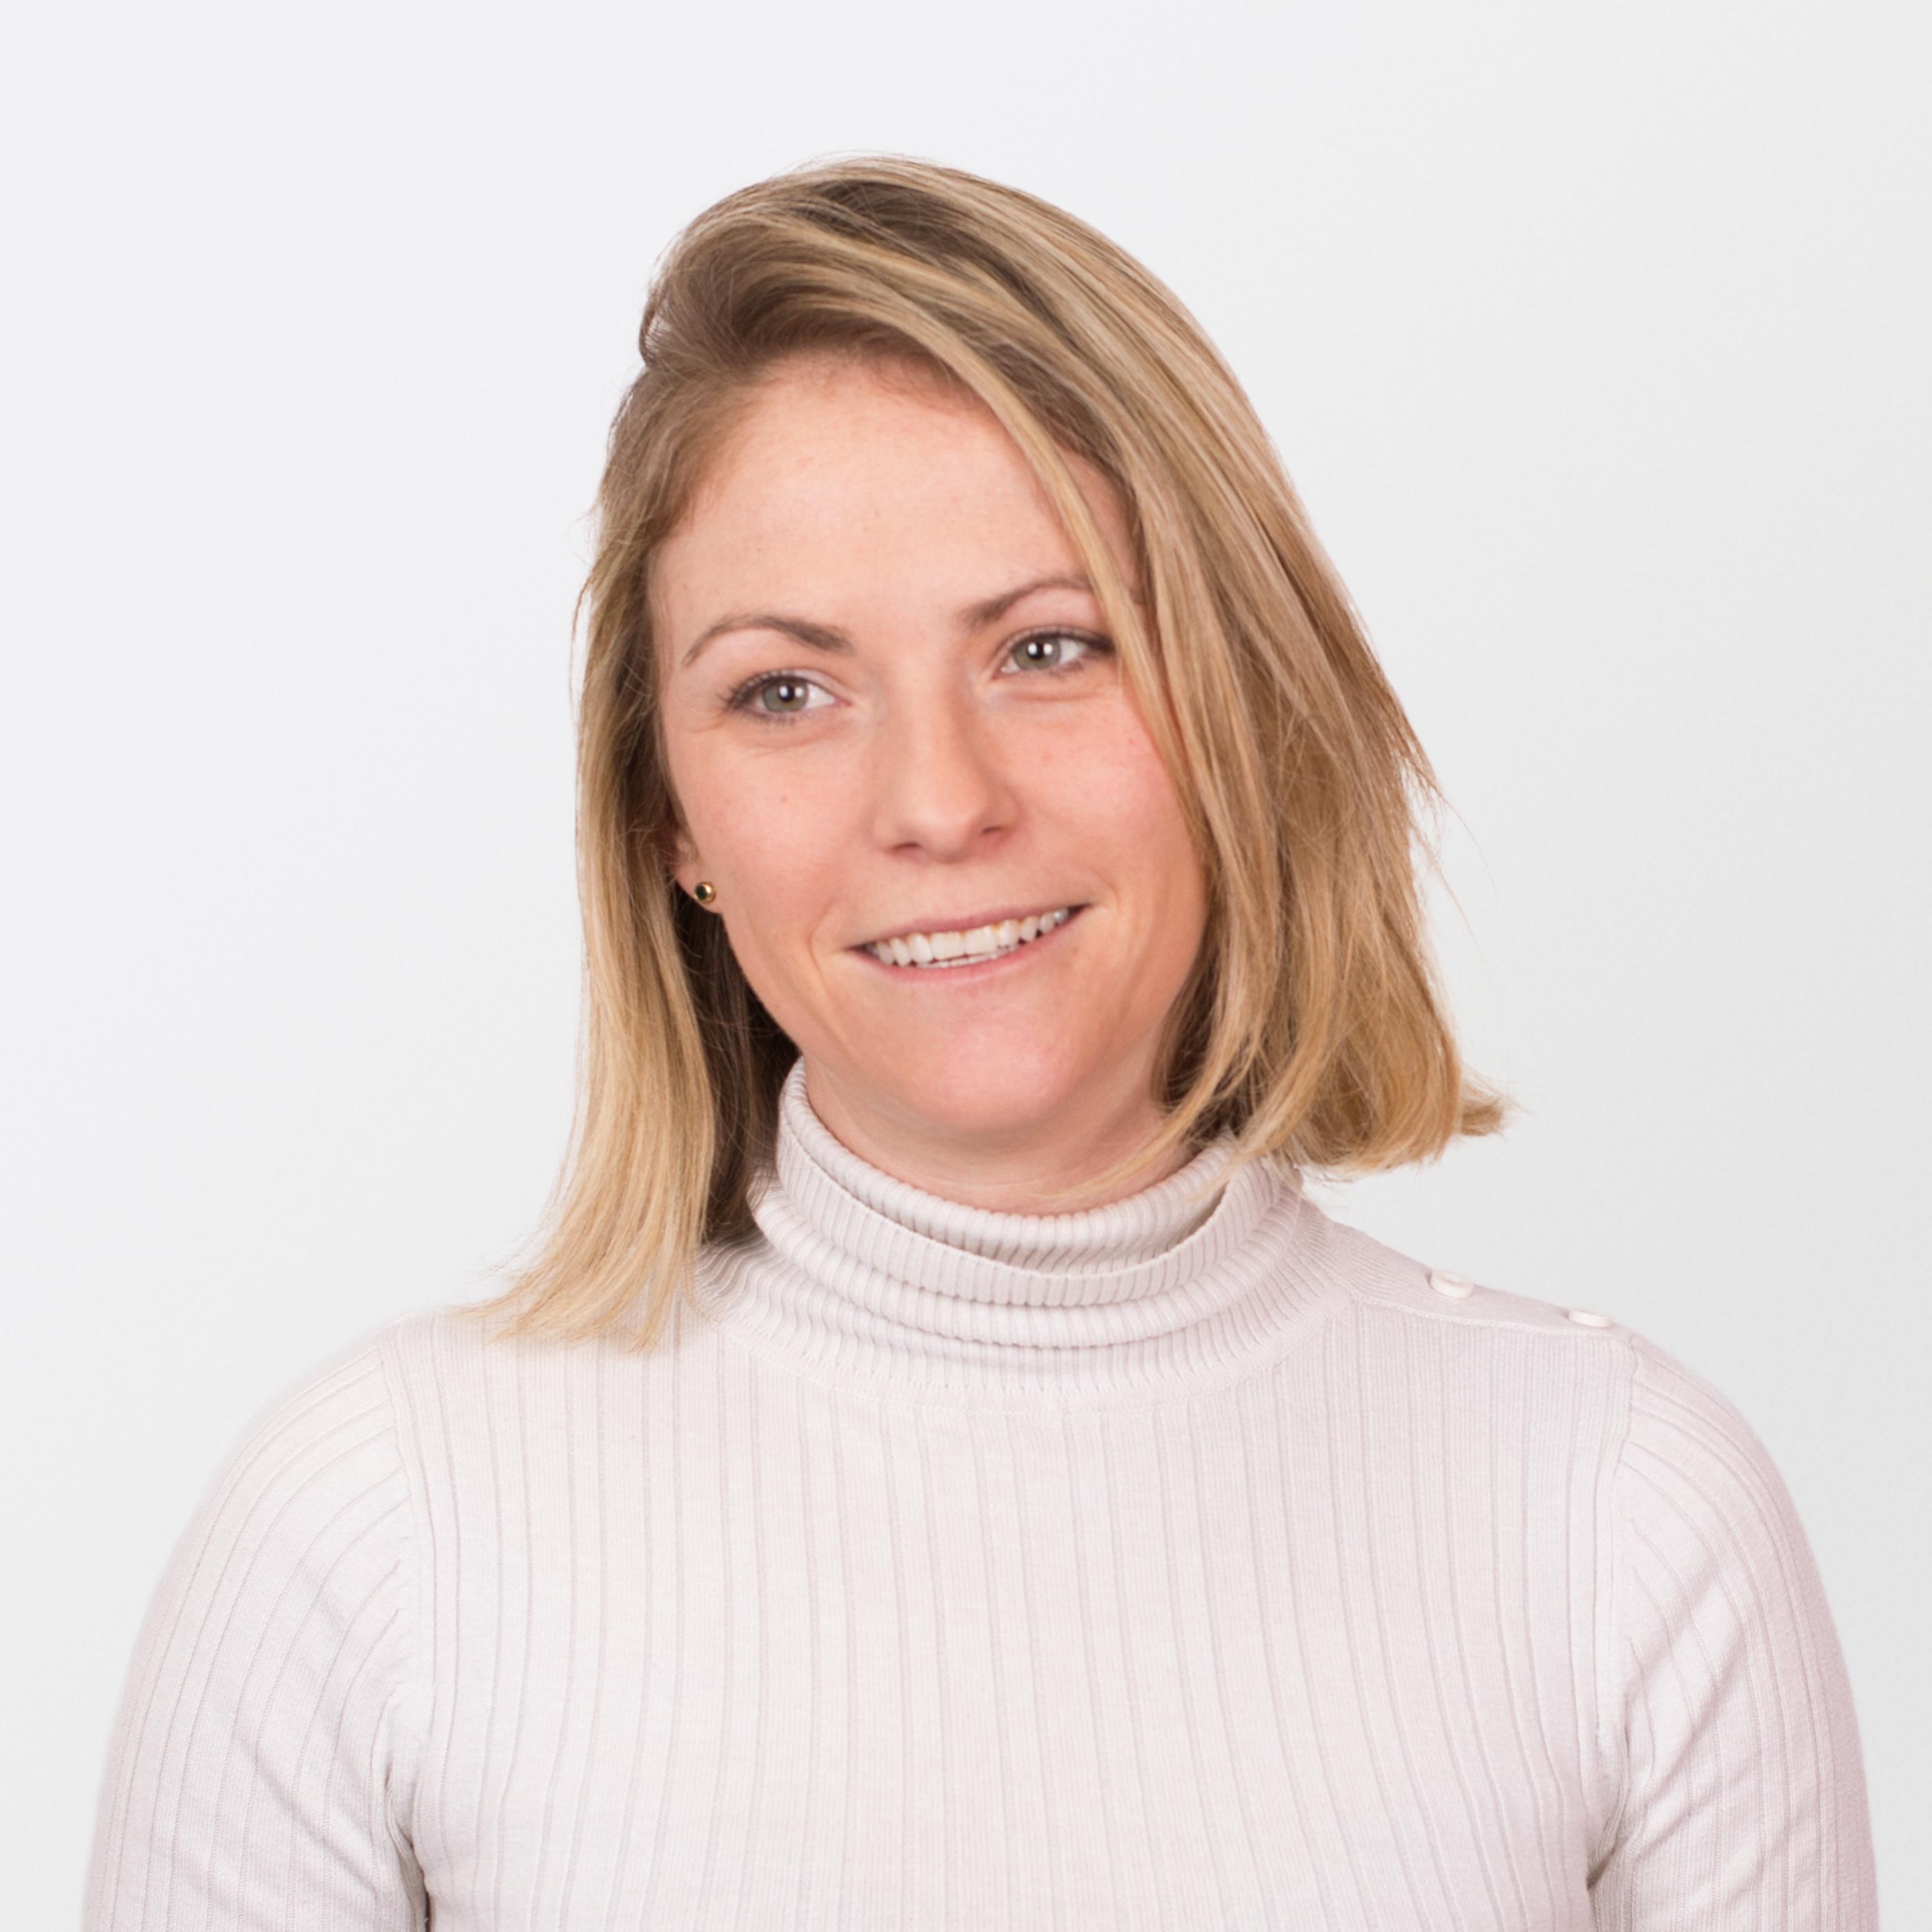 Ingrid Olmesdahl